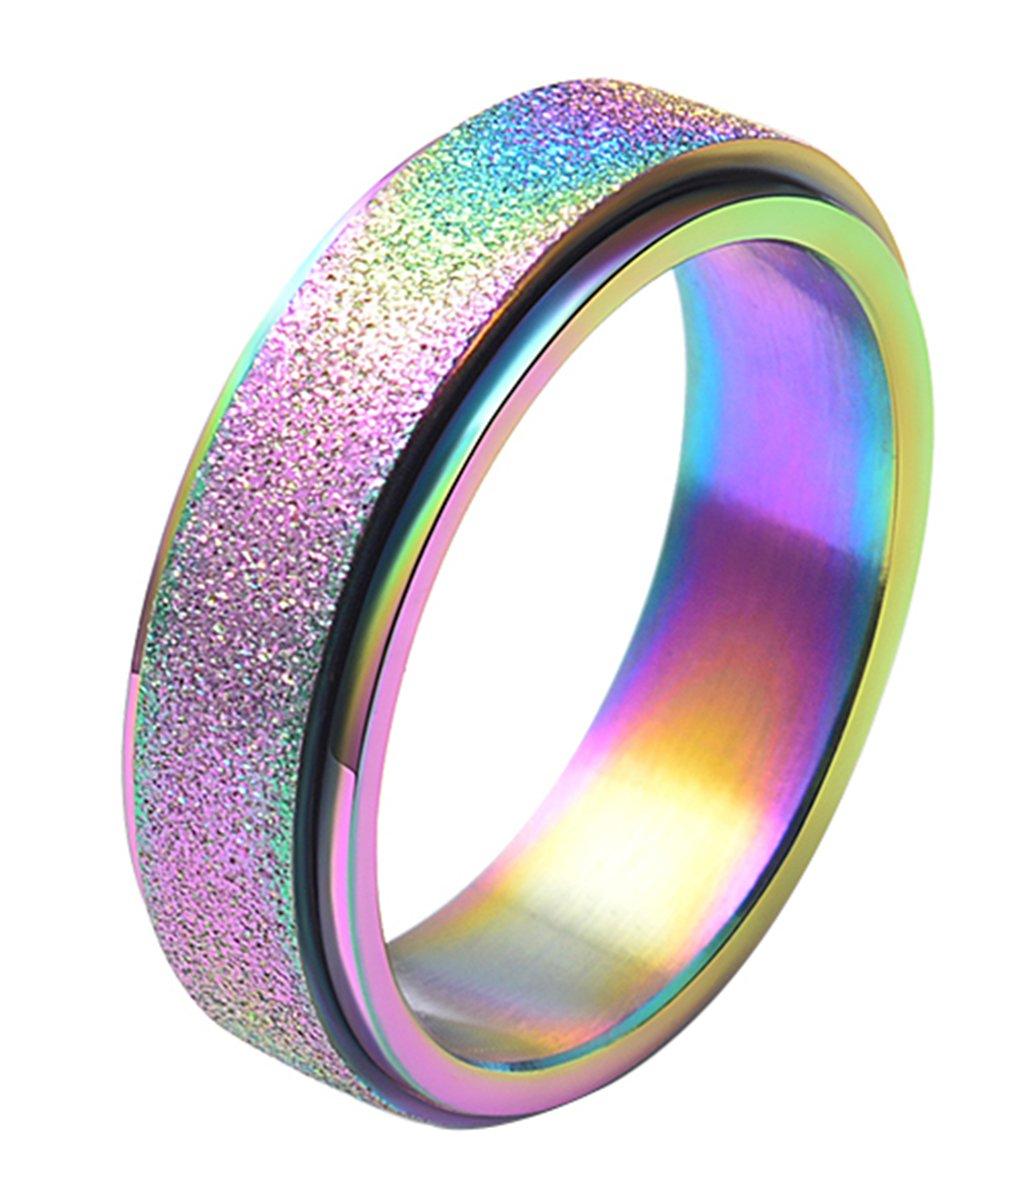 ALEXTINA Women's 6mm Stainless Steel Ring Spinner Band Sand Blast Finish Rainbow size 11